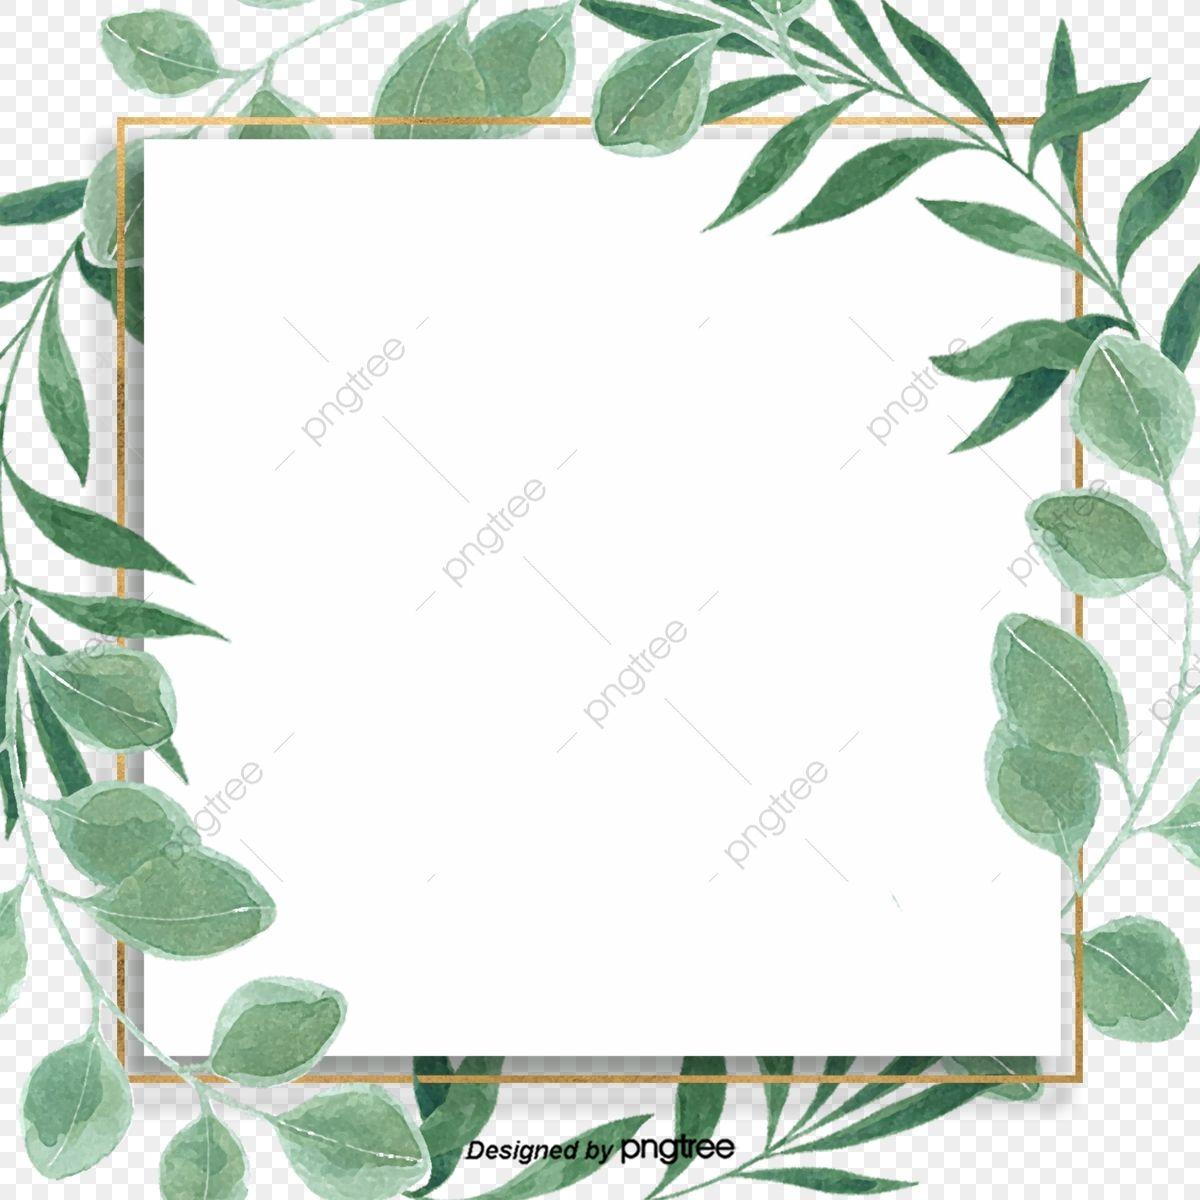 Zielony Maly Orzezwiajacy Lisc Eukaliptusa Granicy Tla Eukaliptus Lisc Liscie Eukaliptusa Png I Plik Psd Do Pobrania Za Darmo Poster Bunga Latar Belakang Kayu Putih